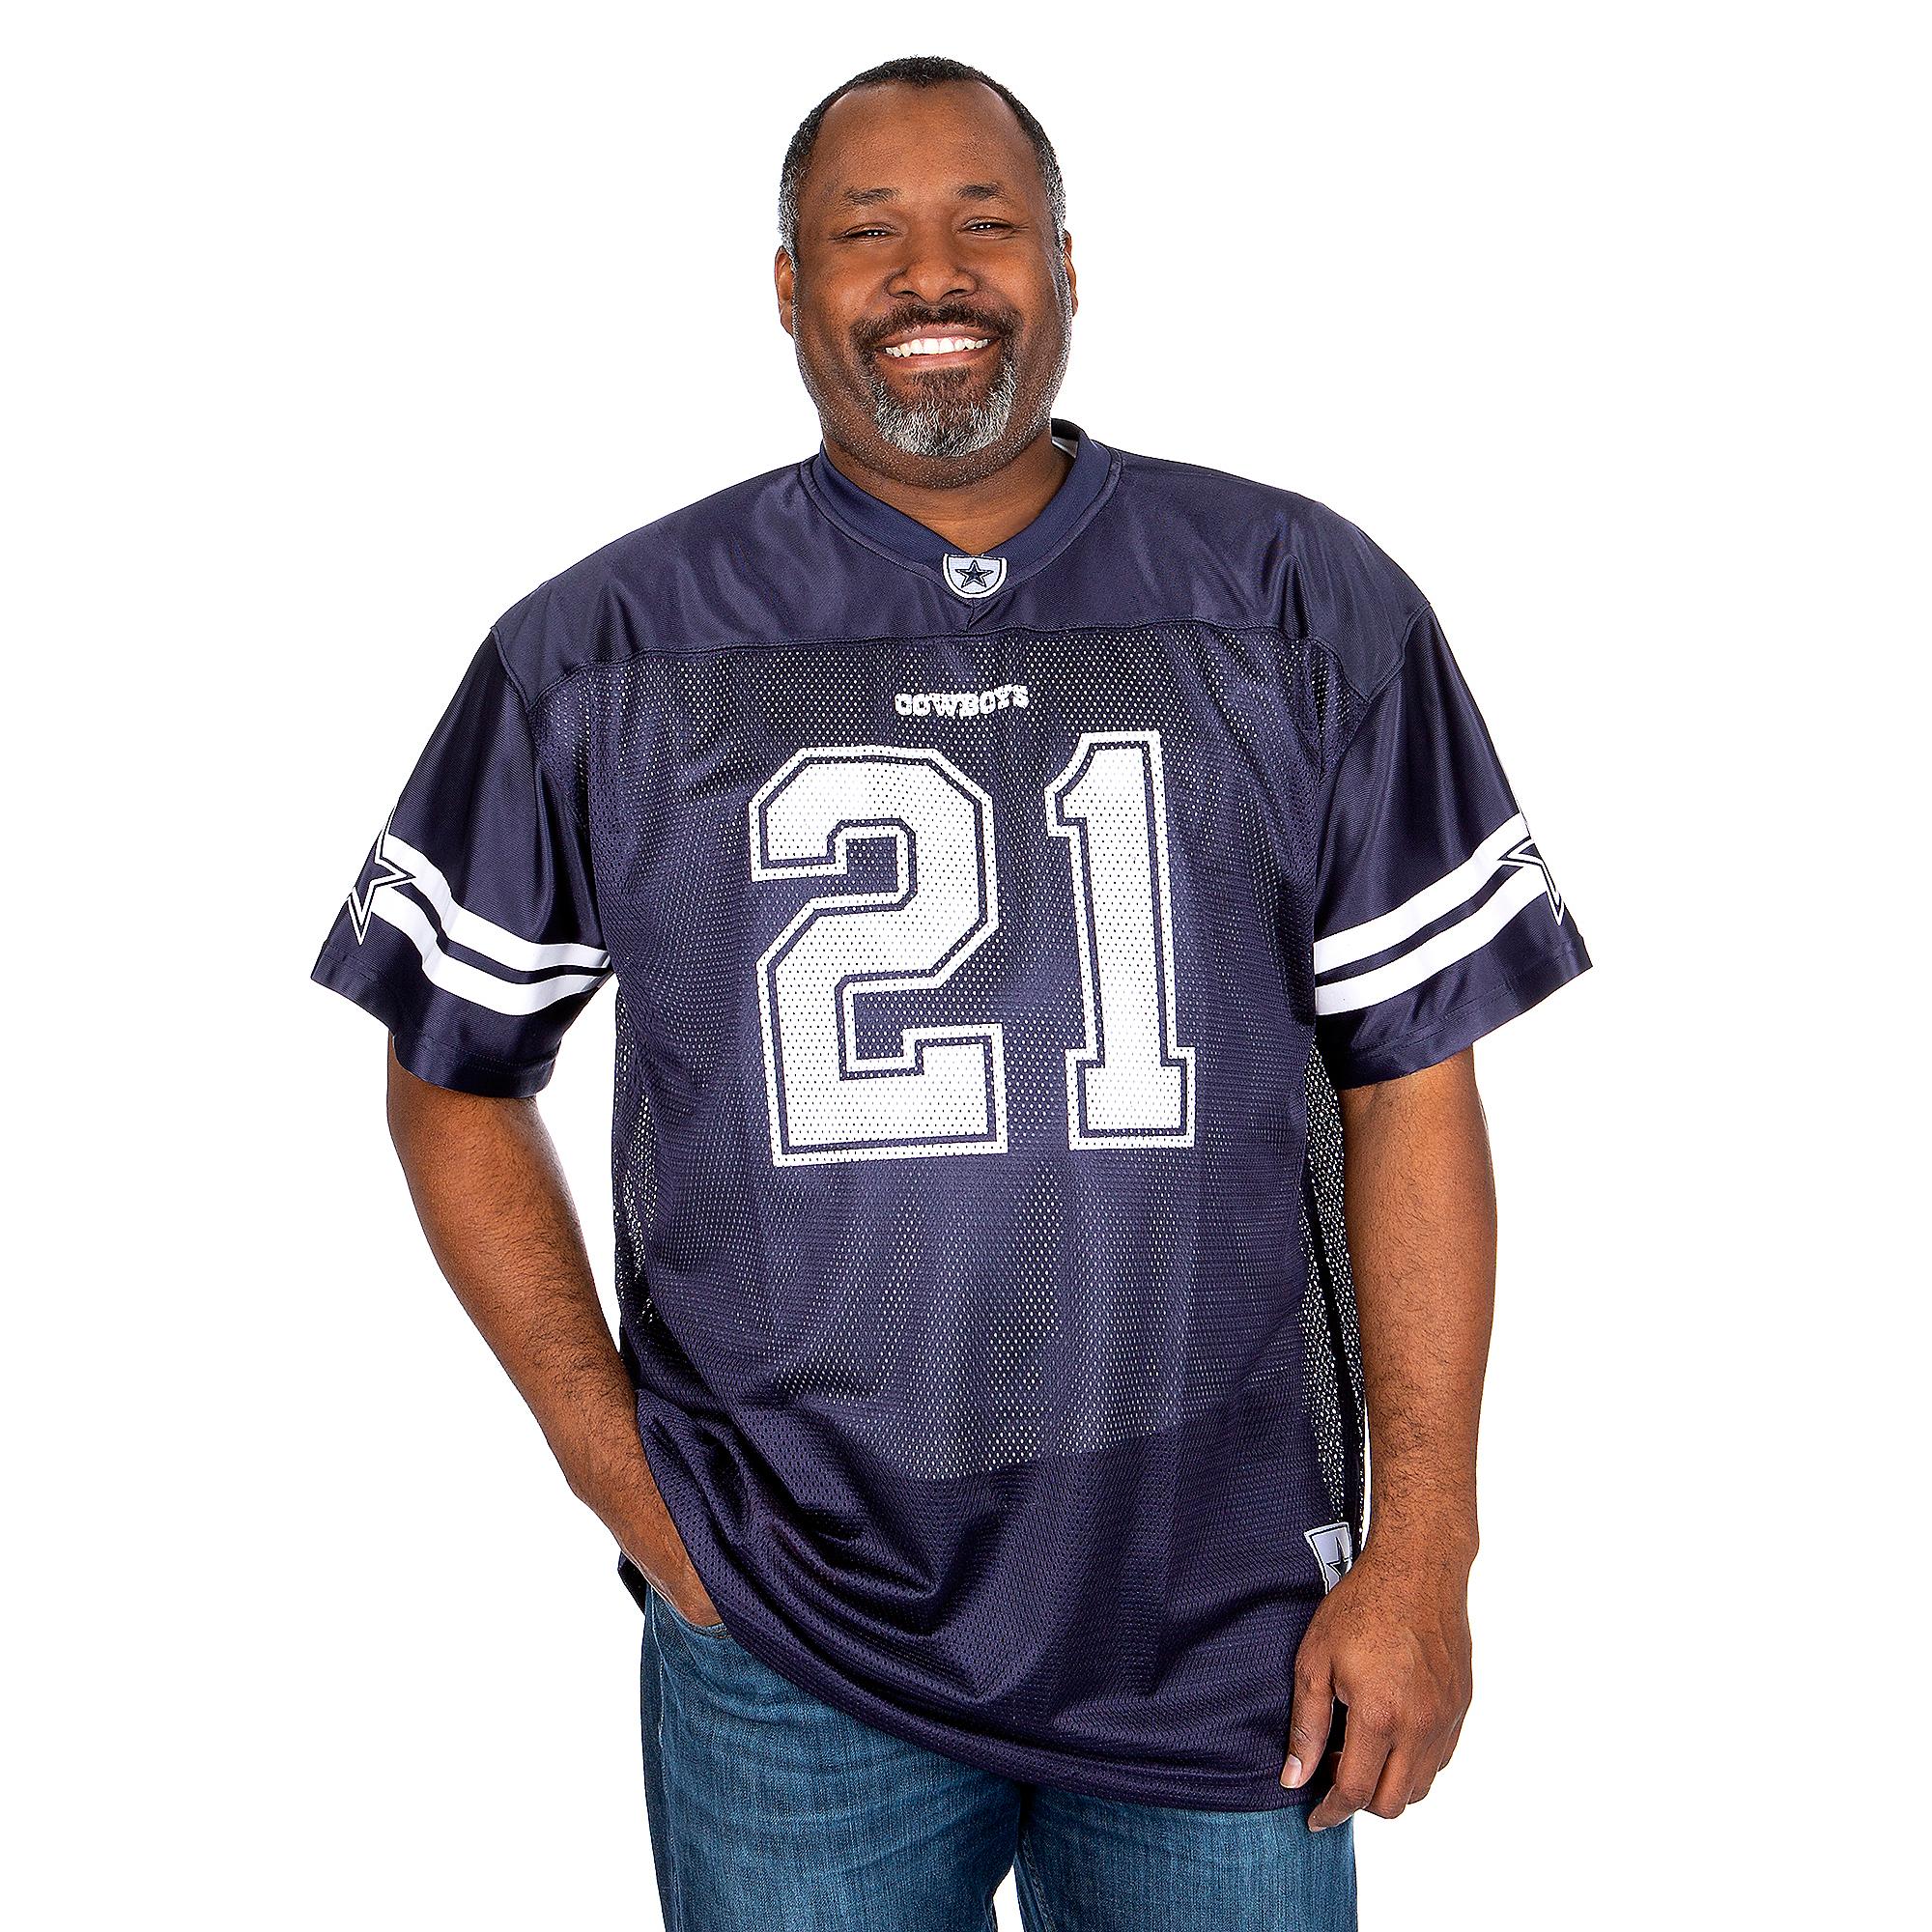 c127abe5 Dallas Cowboys Big and Tall Ezekiel Elliott Jersey | Dallas Cowboys Pro Shop